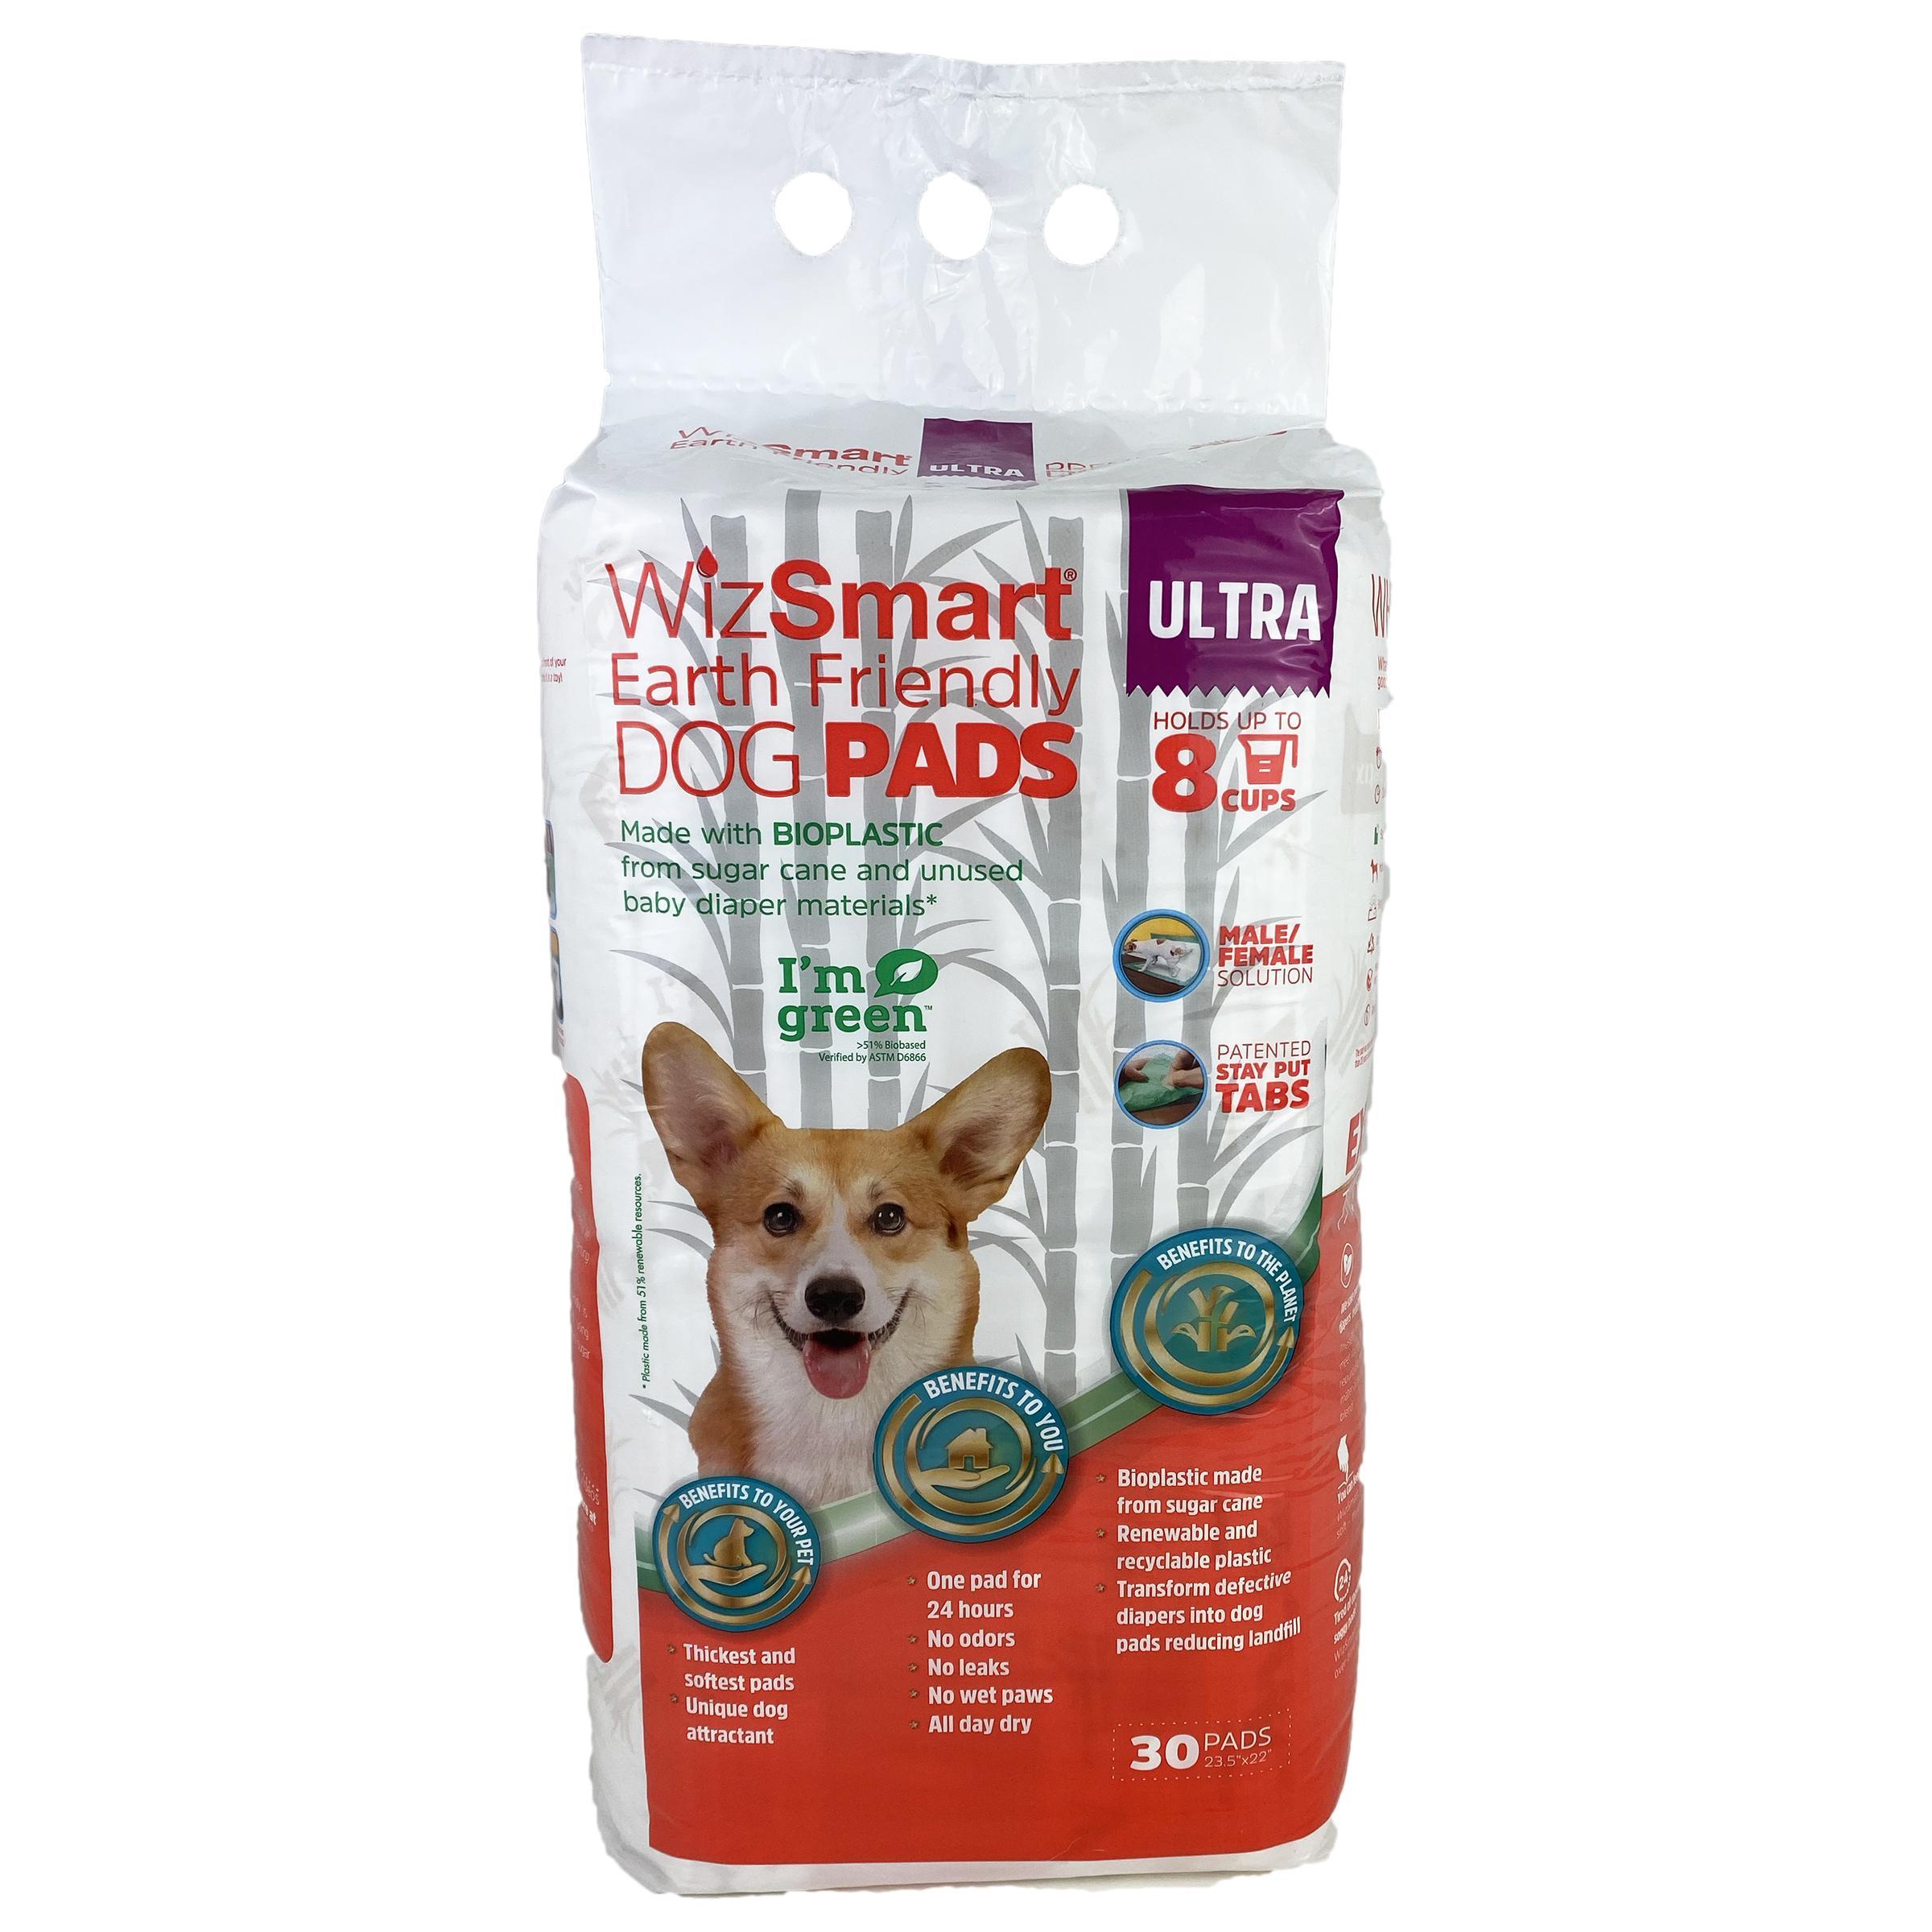 Wizsmart Earth Friendly Ultra Dog Pad, 30-count